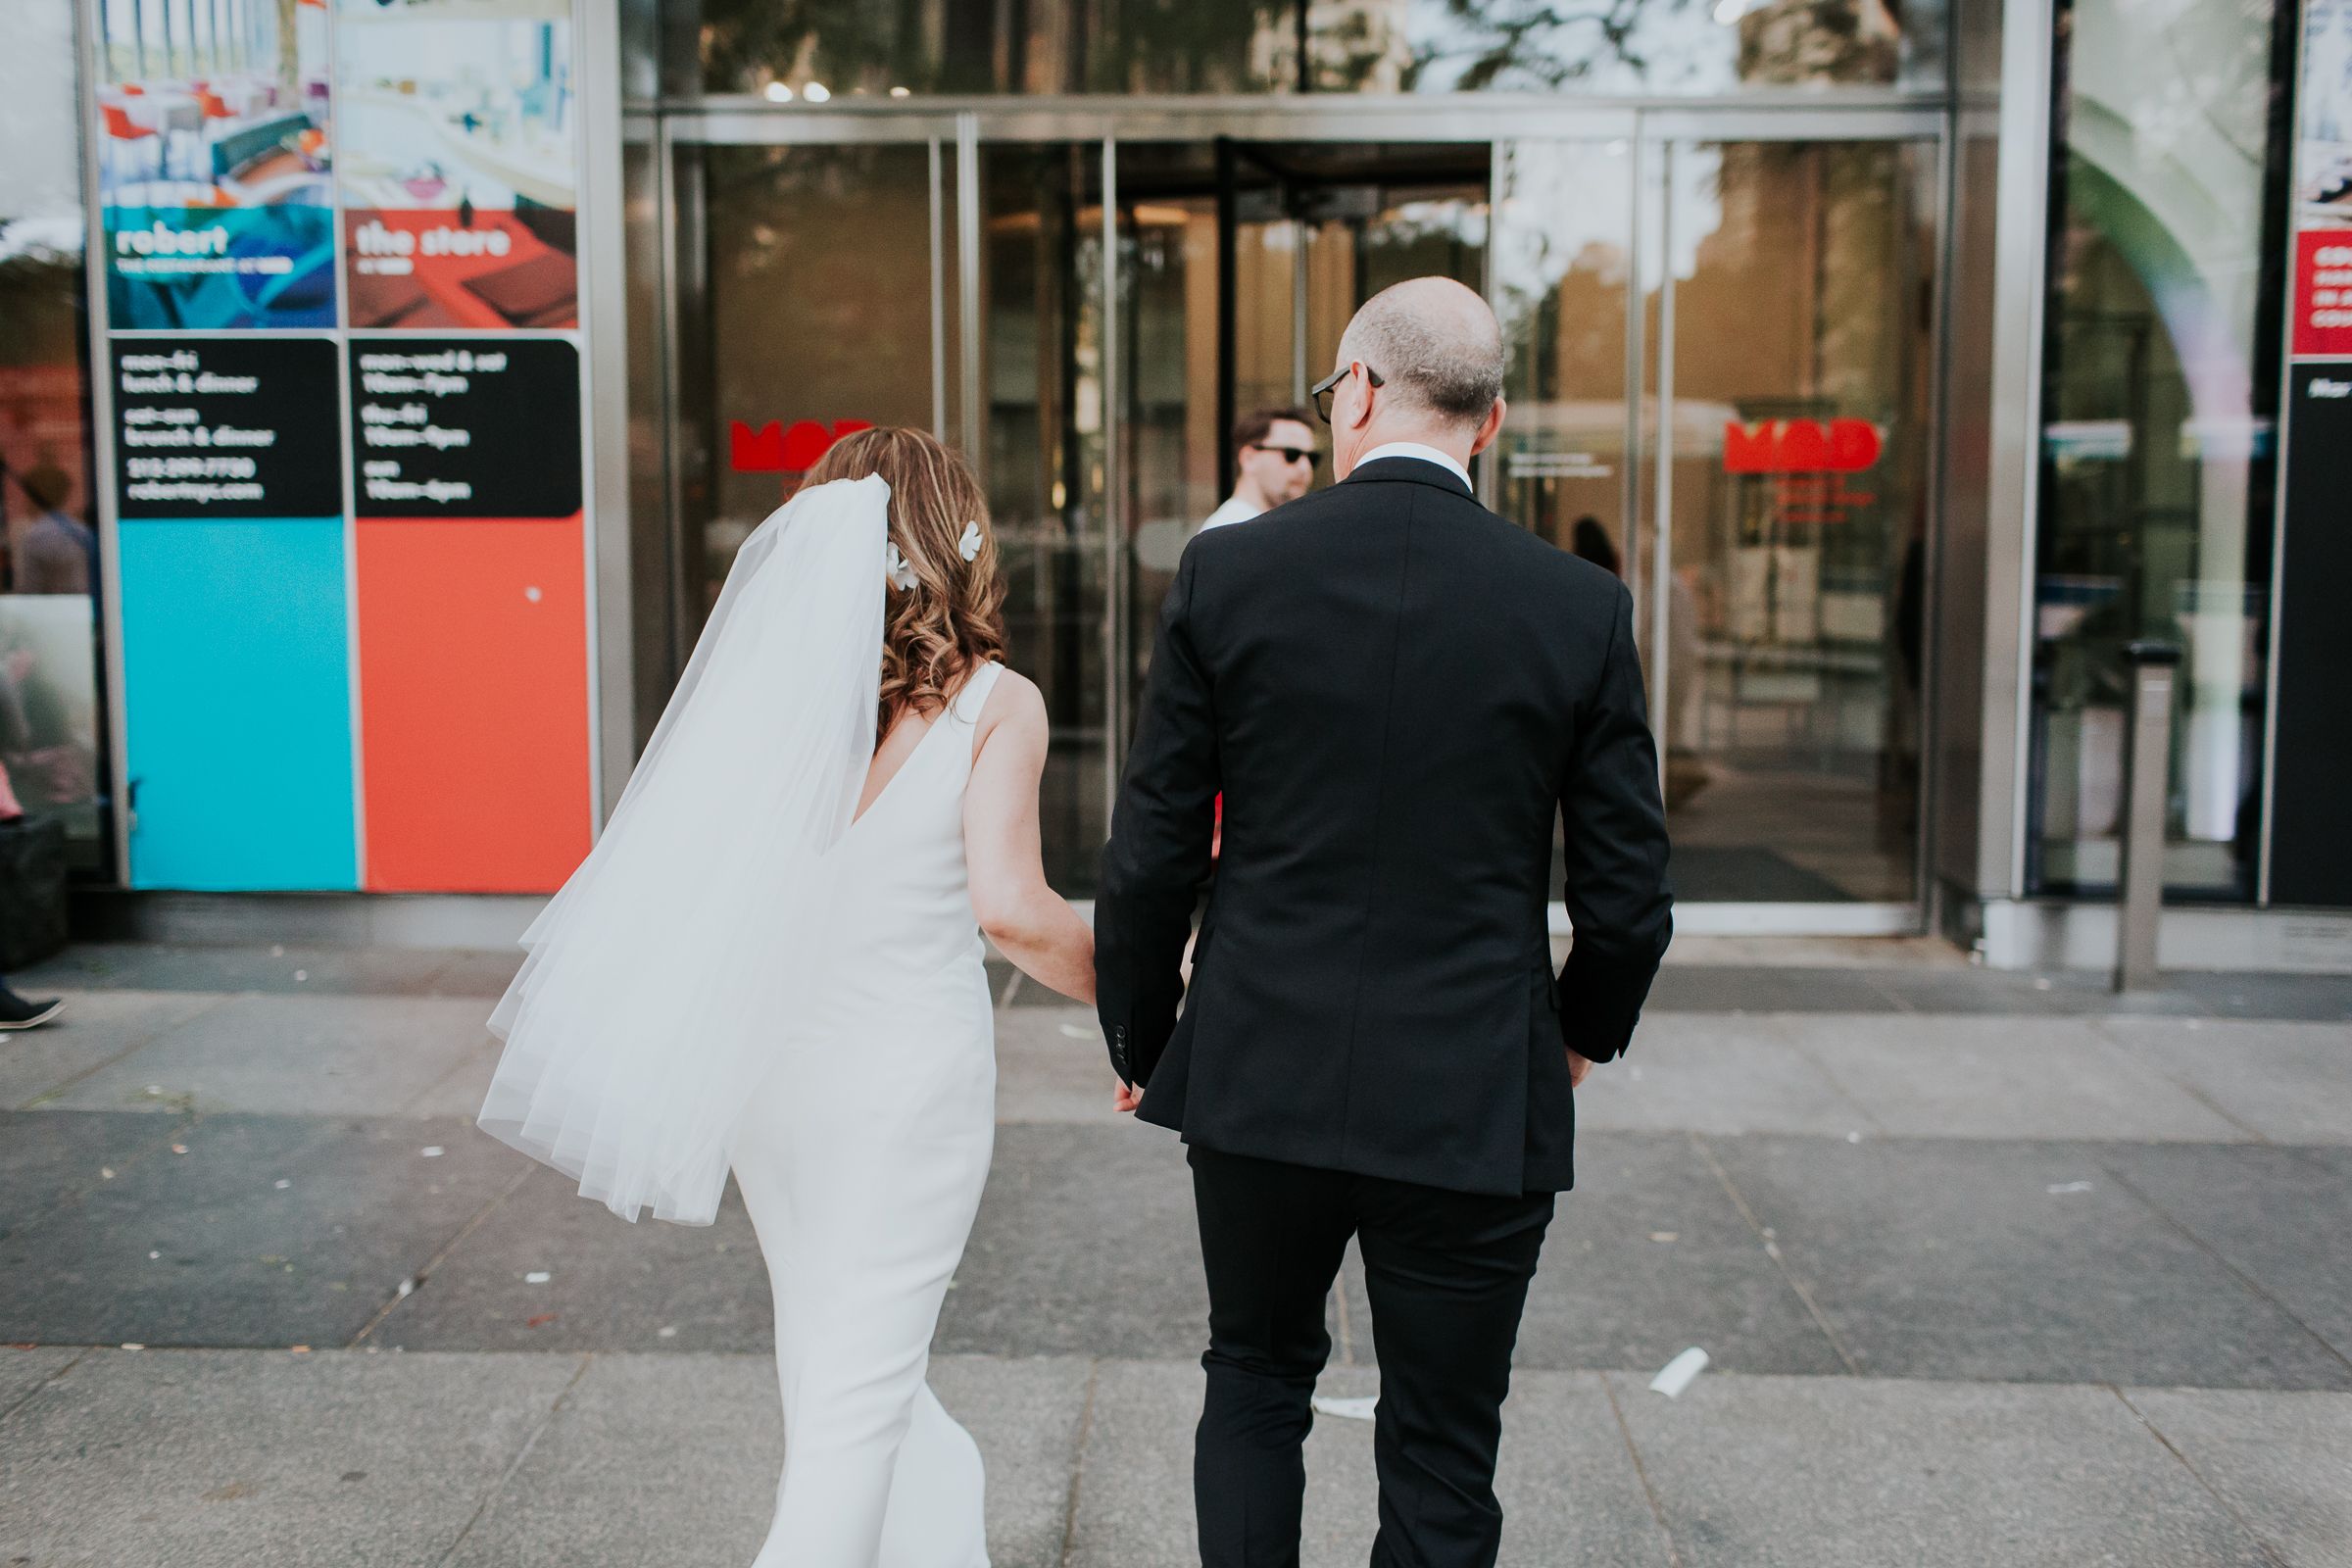 Robert-NYC-Museum-Of-Arts-&-Design-Greek-Italian-New-York-Documentary-Wedding-Photographer-42.jpg